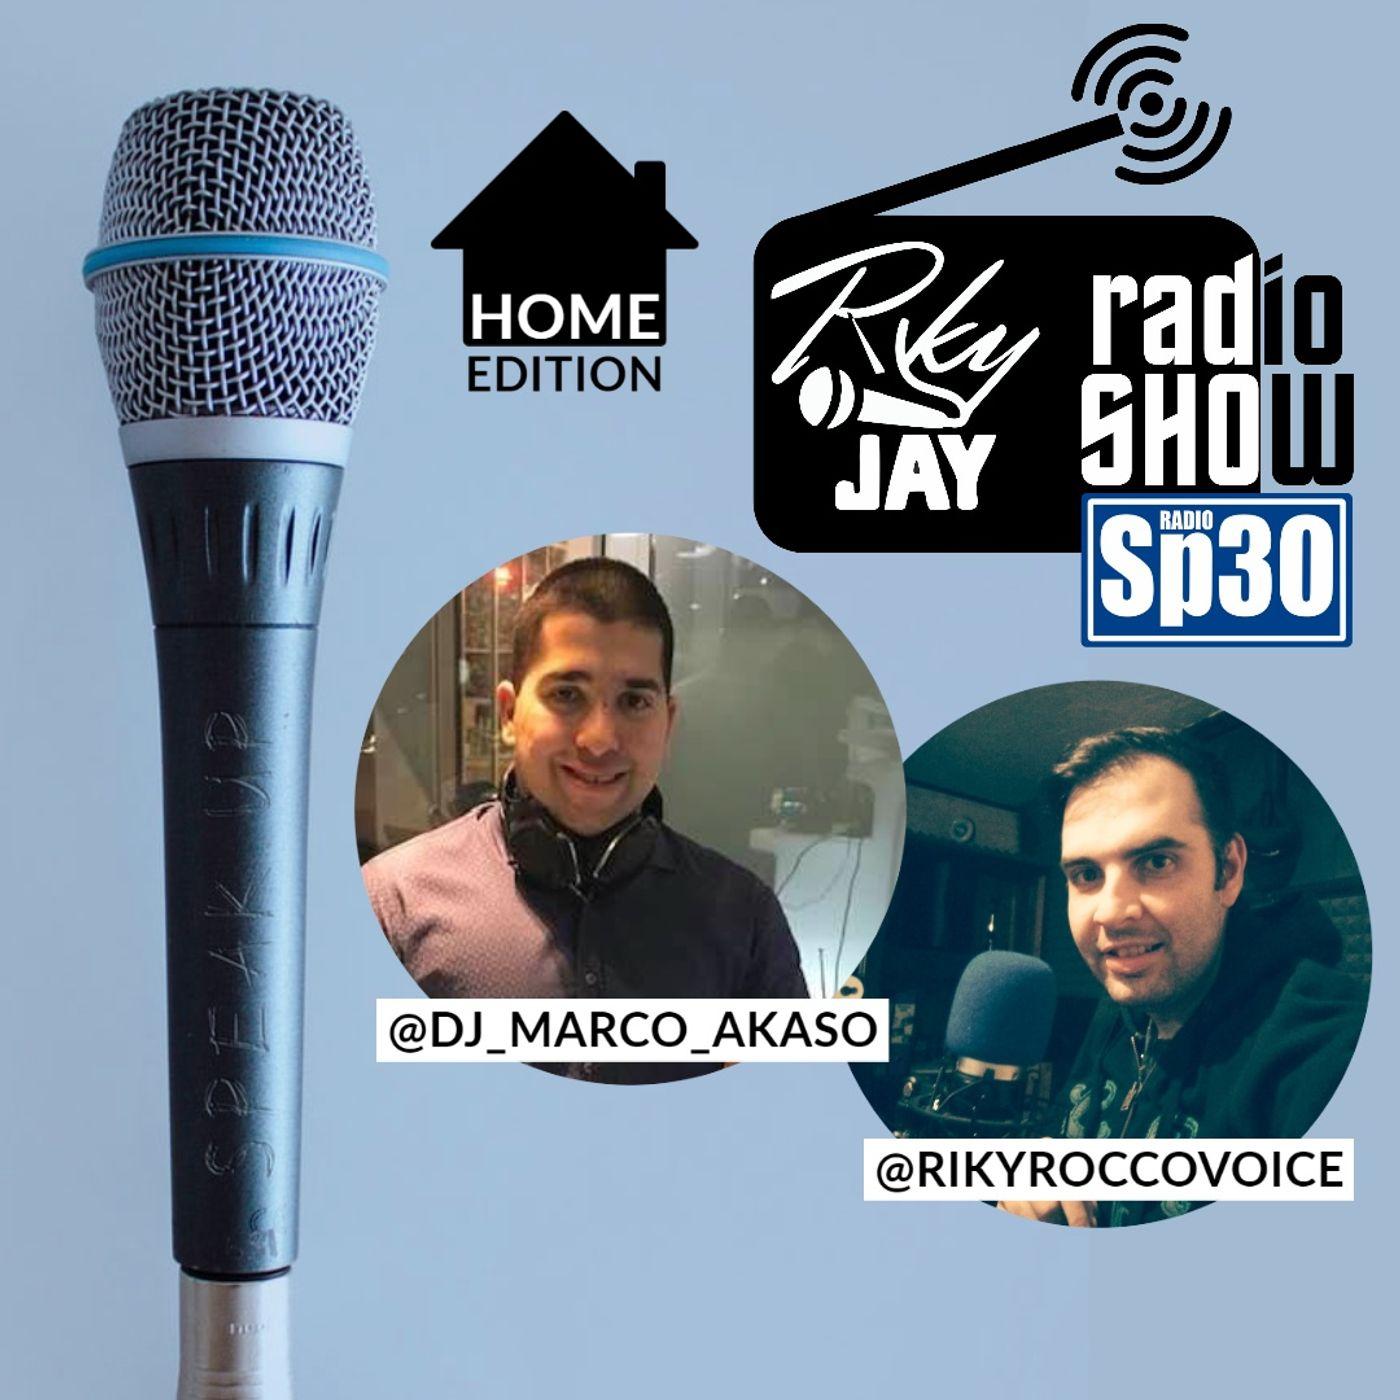 RikyJay Radio Show - #25 - Home Edition